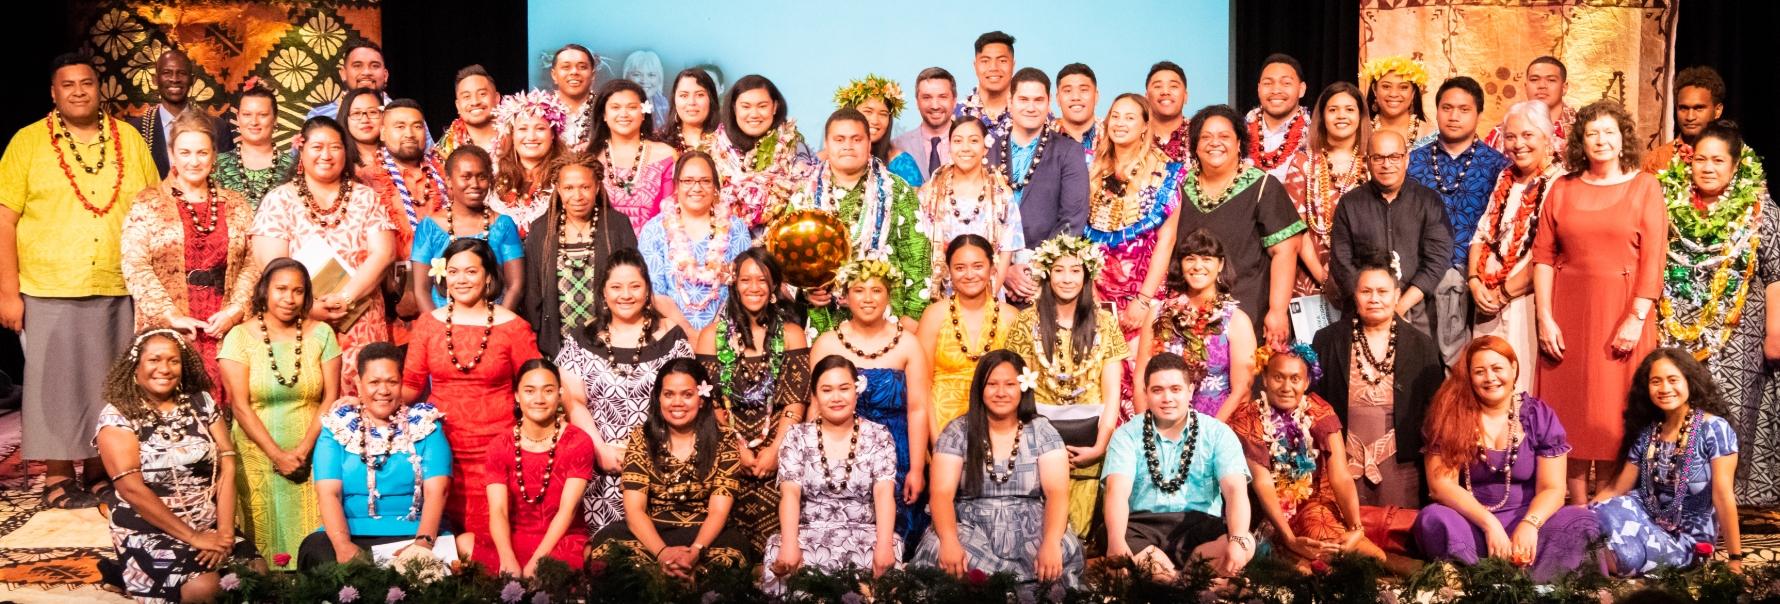 A group of Pasifika Graduates in colourful attire.